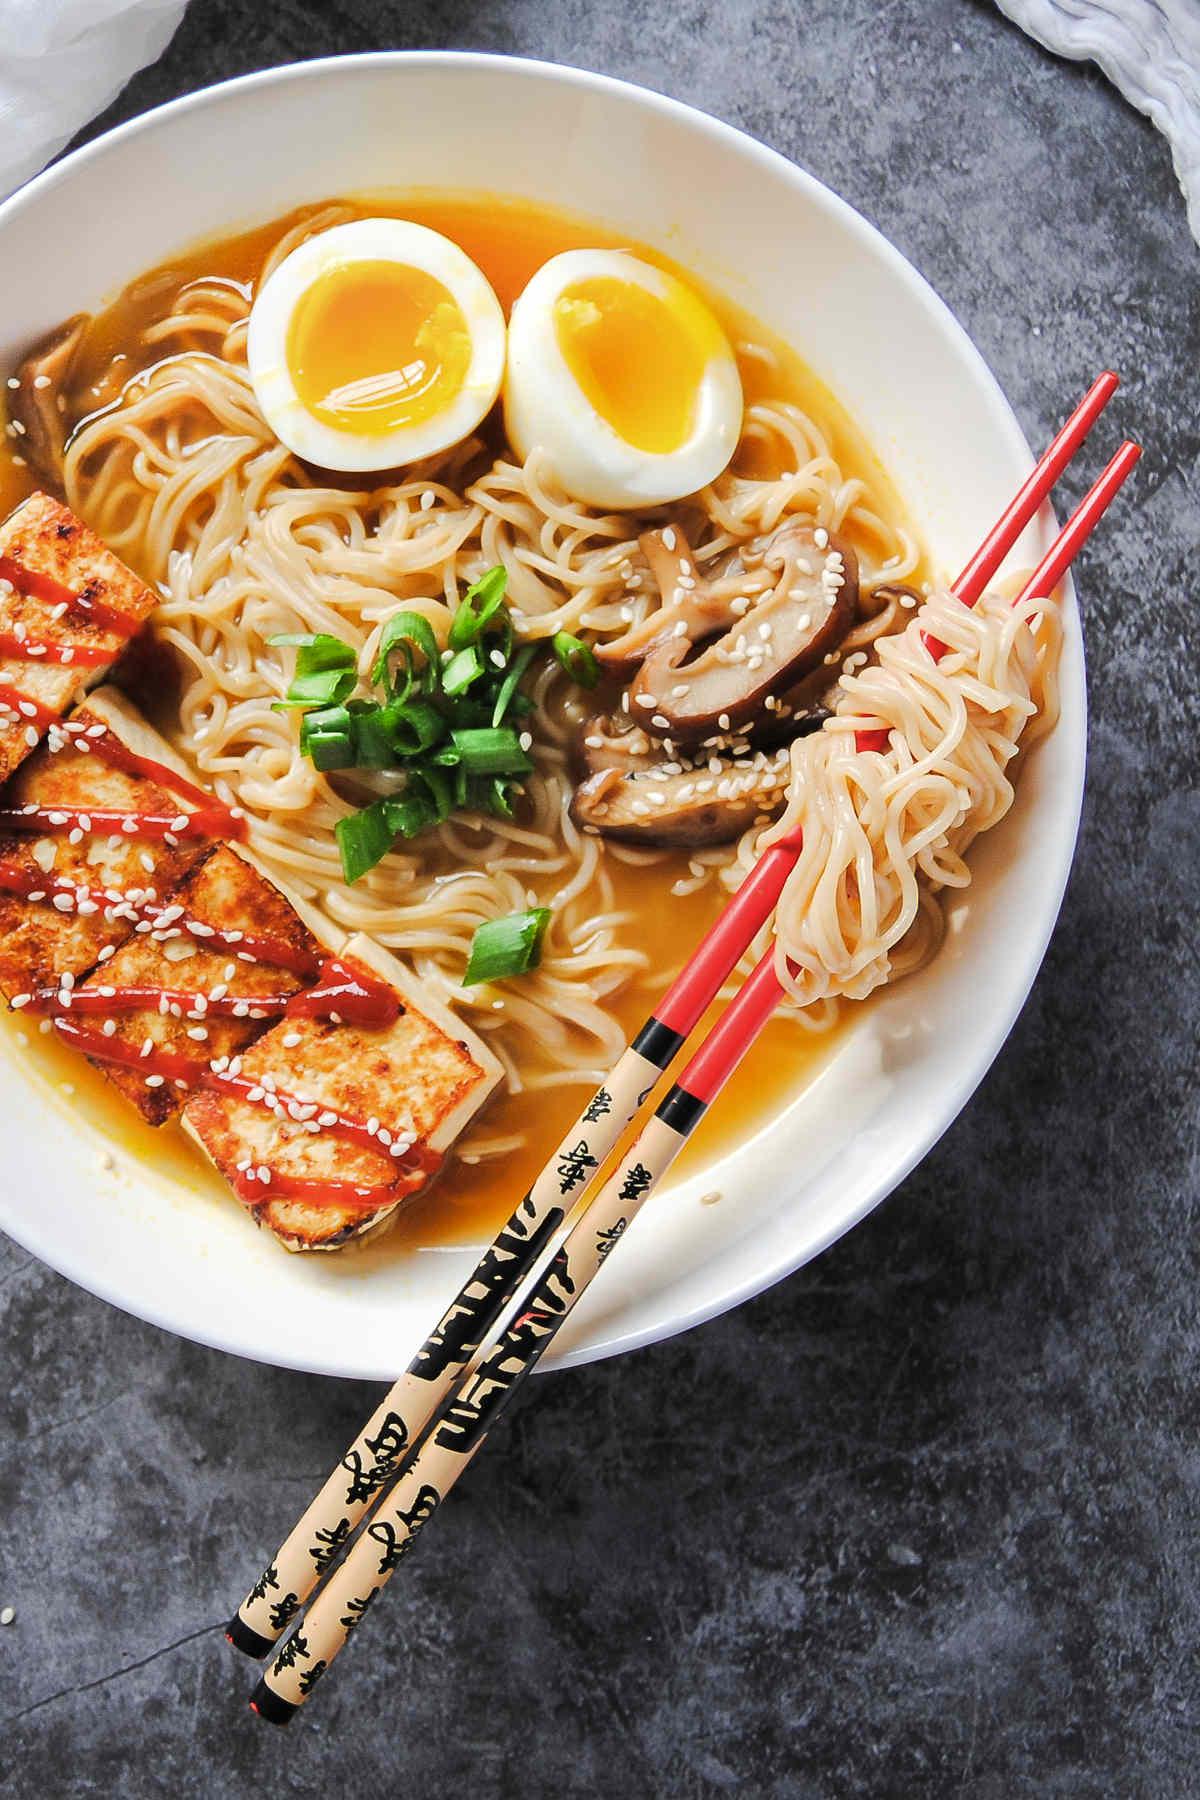 Easy-Vegetarian-Ramen-With-Tofu-Portrait-With-Chopsticks